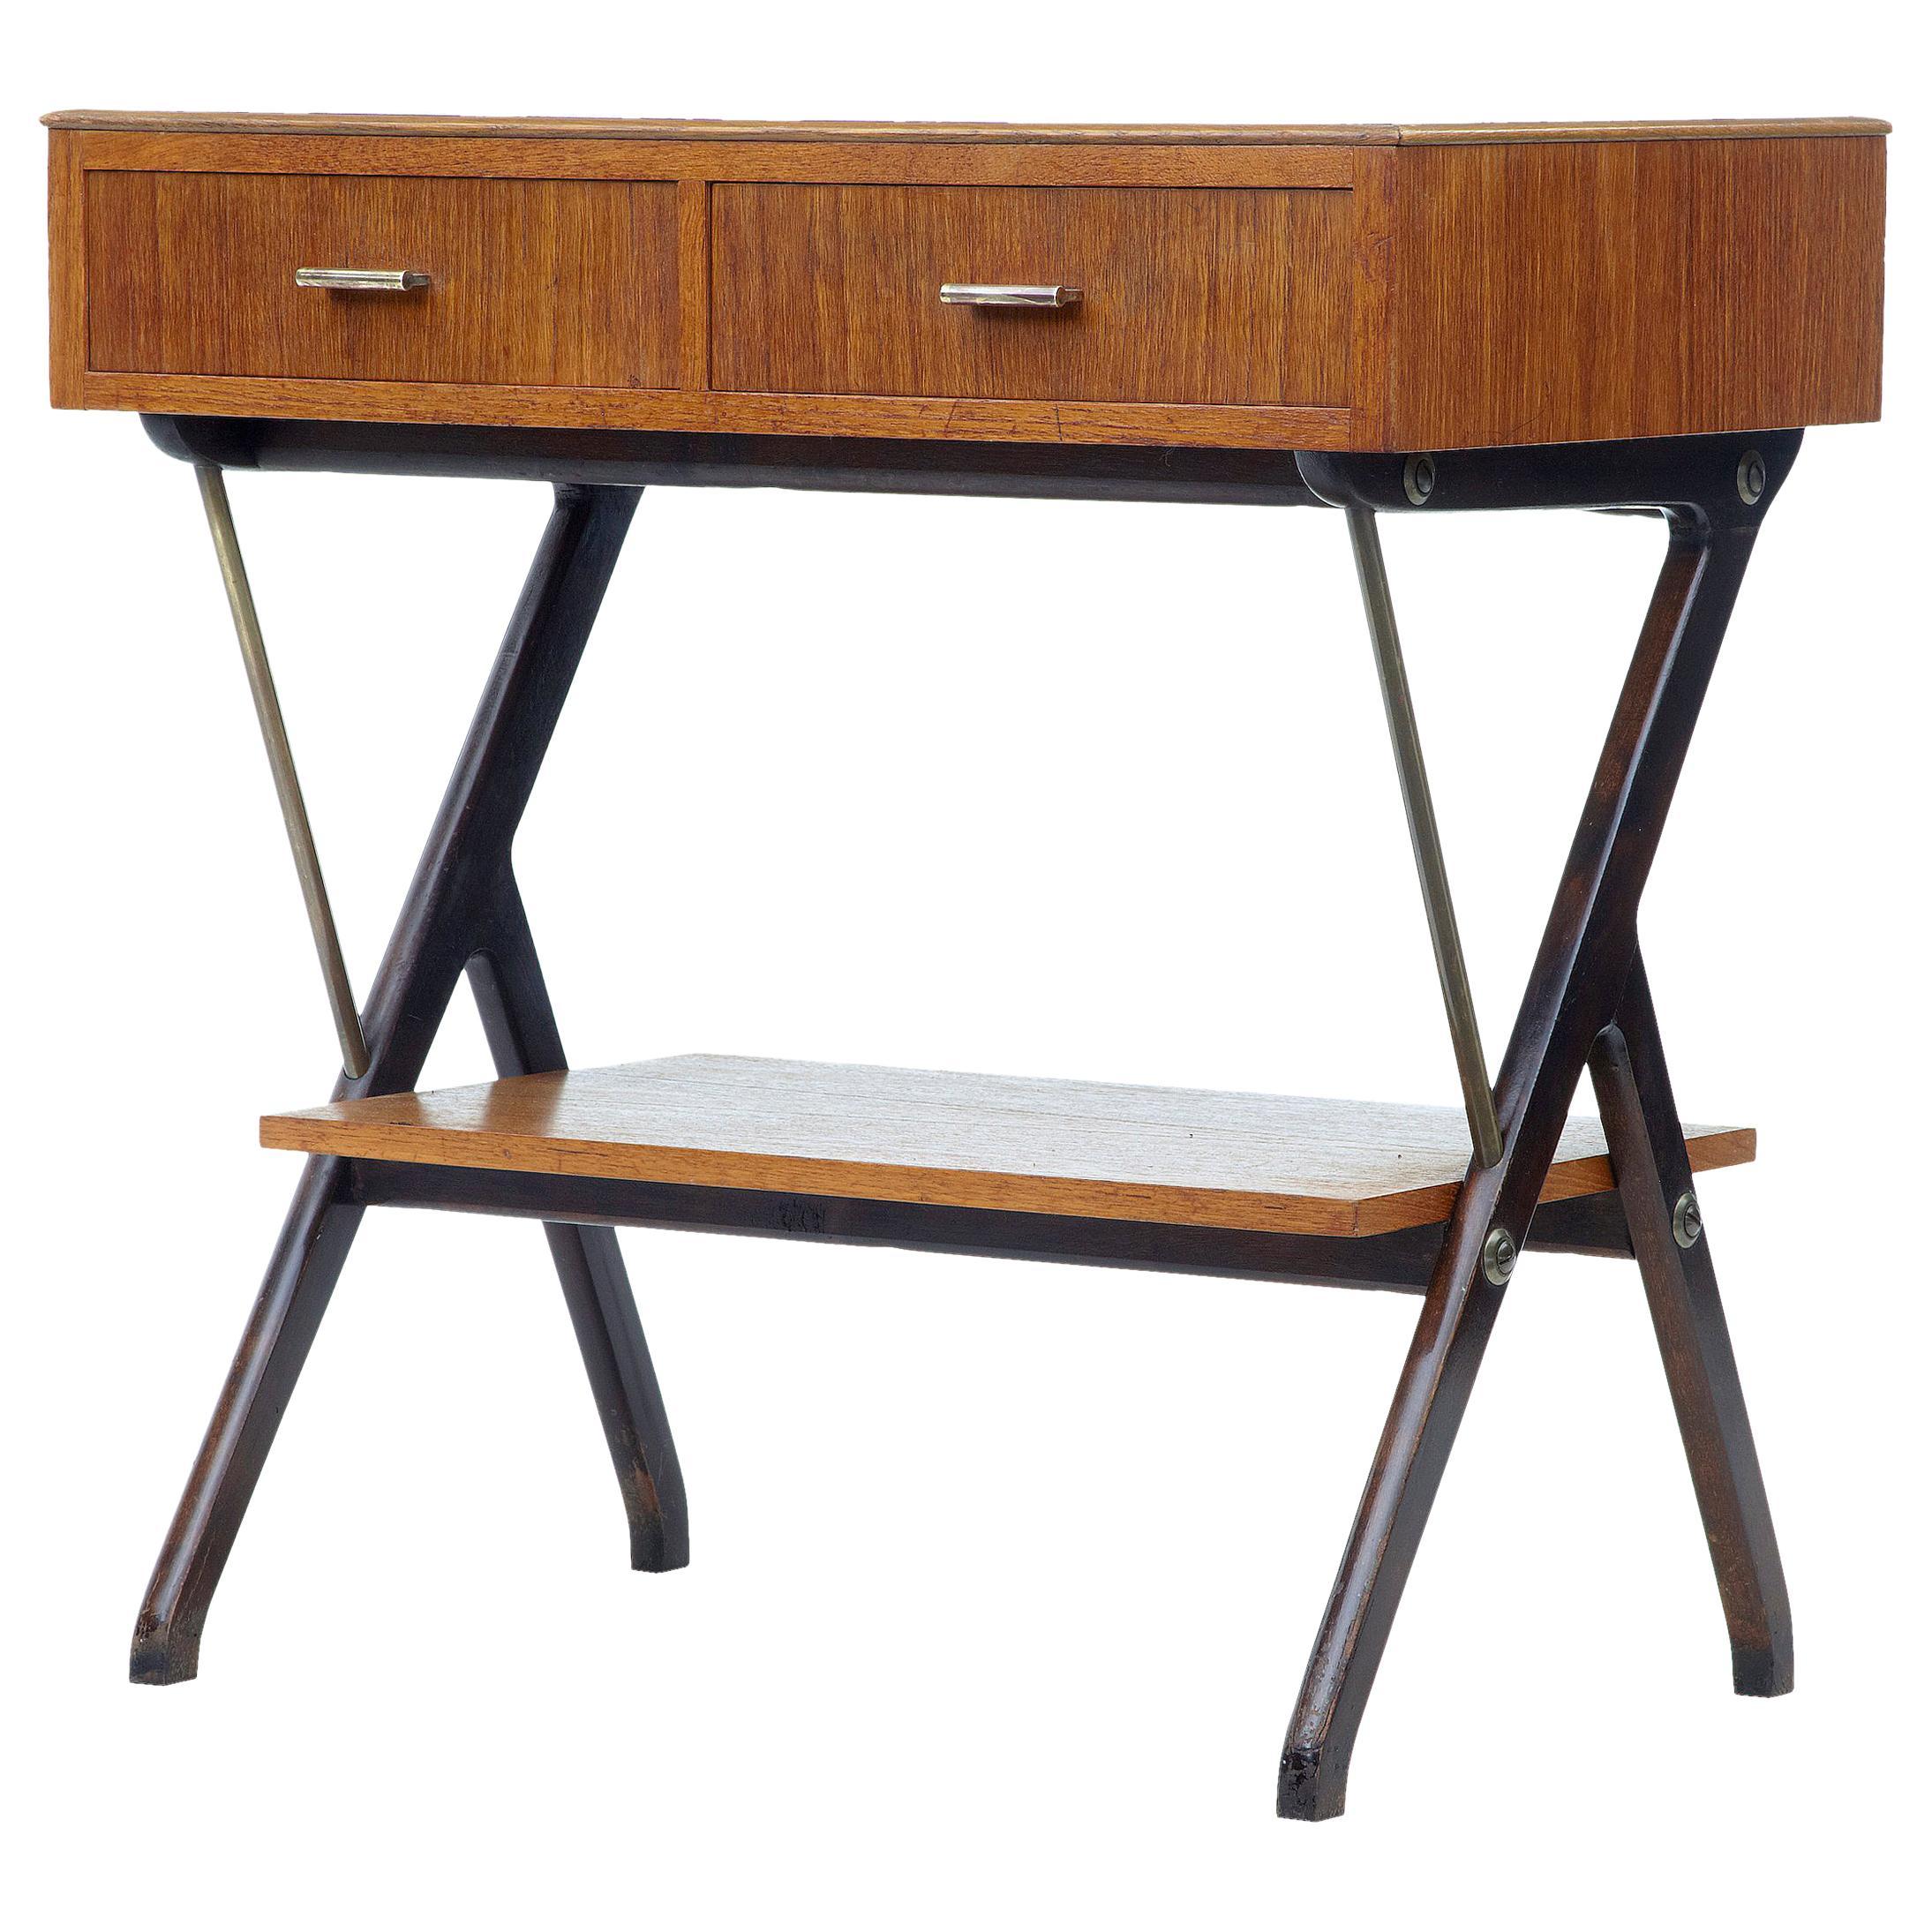 Mid-20th Century Scandinavian Modern Teak Side Table